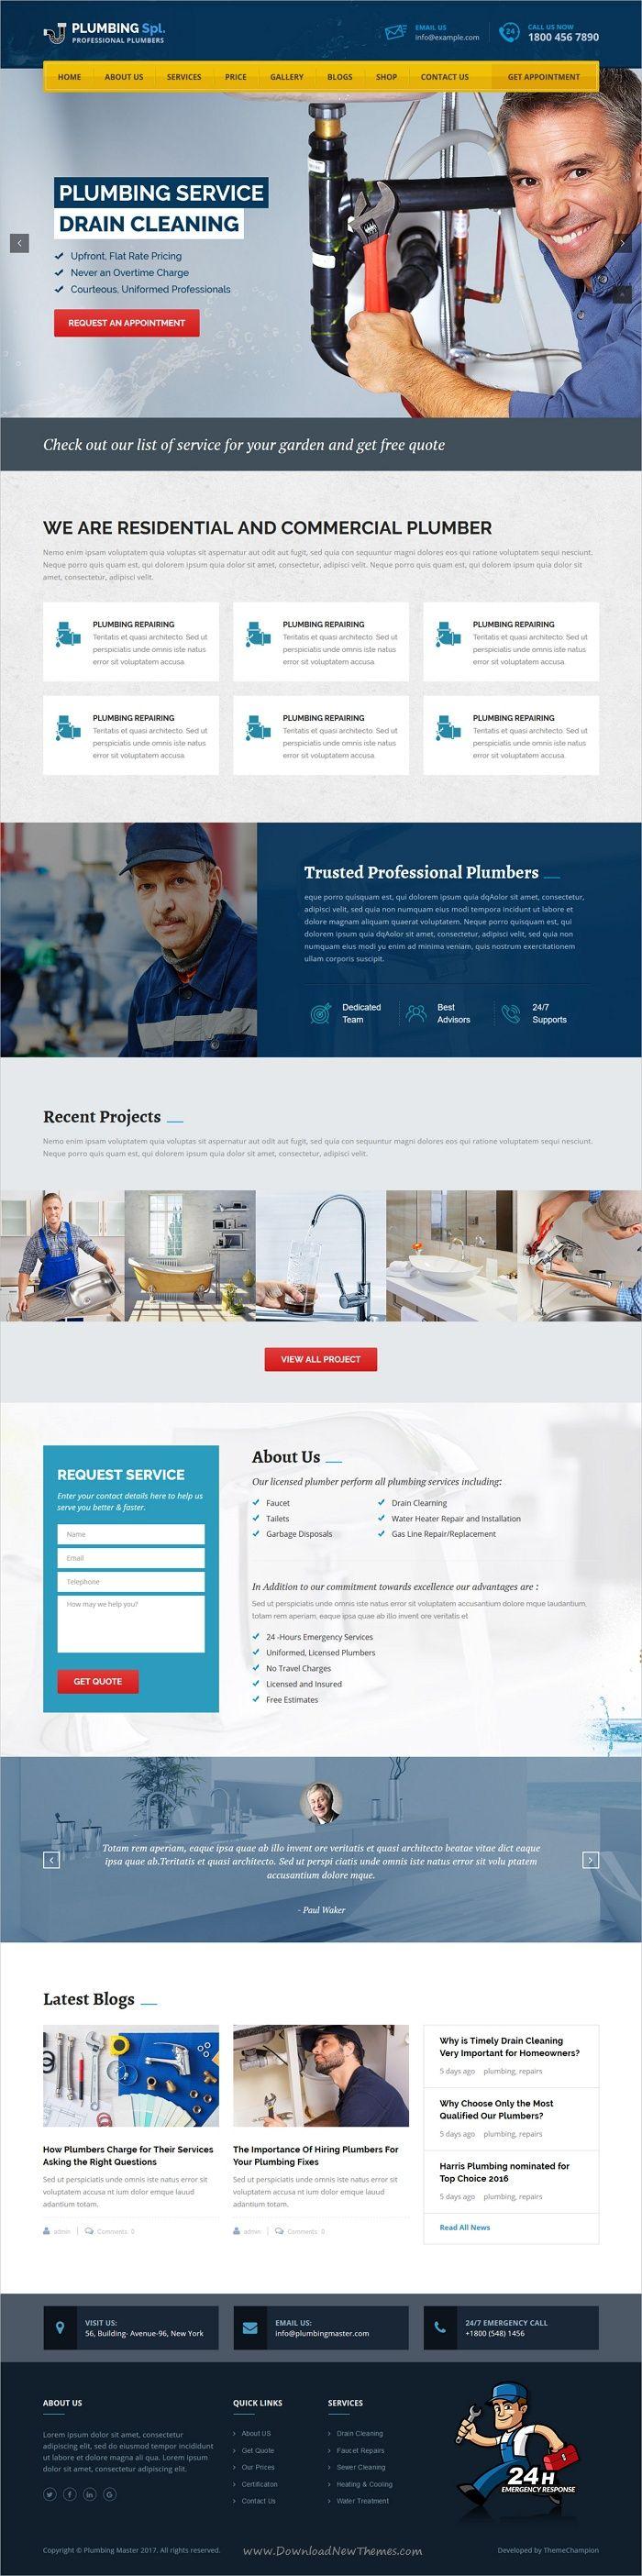 Plumbing Spl Plumber Wordpress Theme Plumbing Beautiful Website Design Plumber